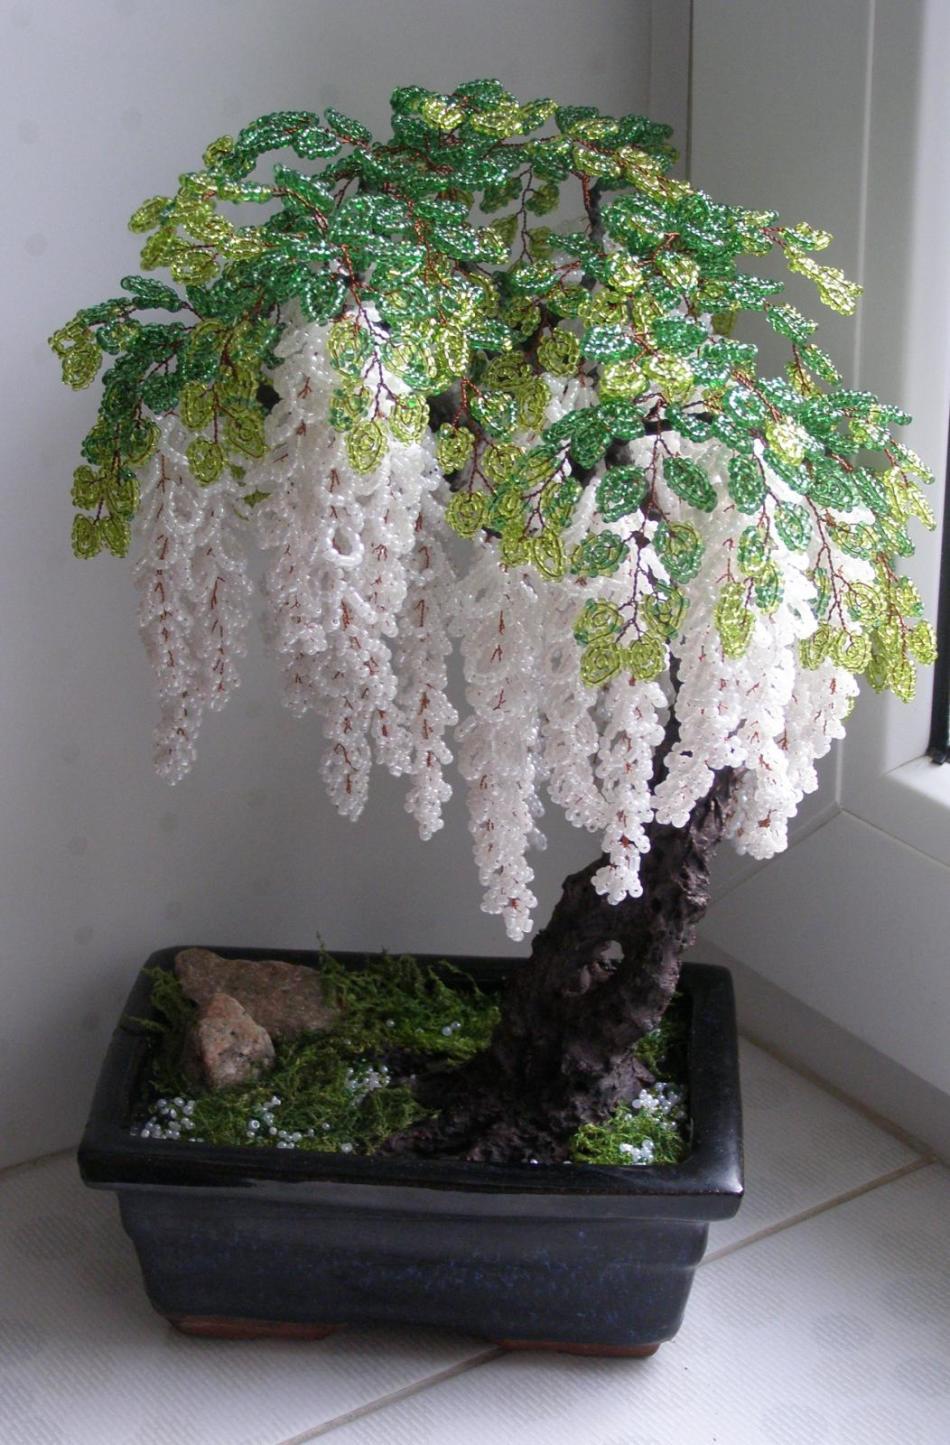 gliciniya-iz-bisera Ива с тонкими листочками из бисера